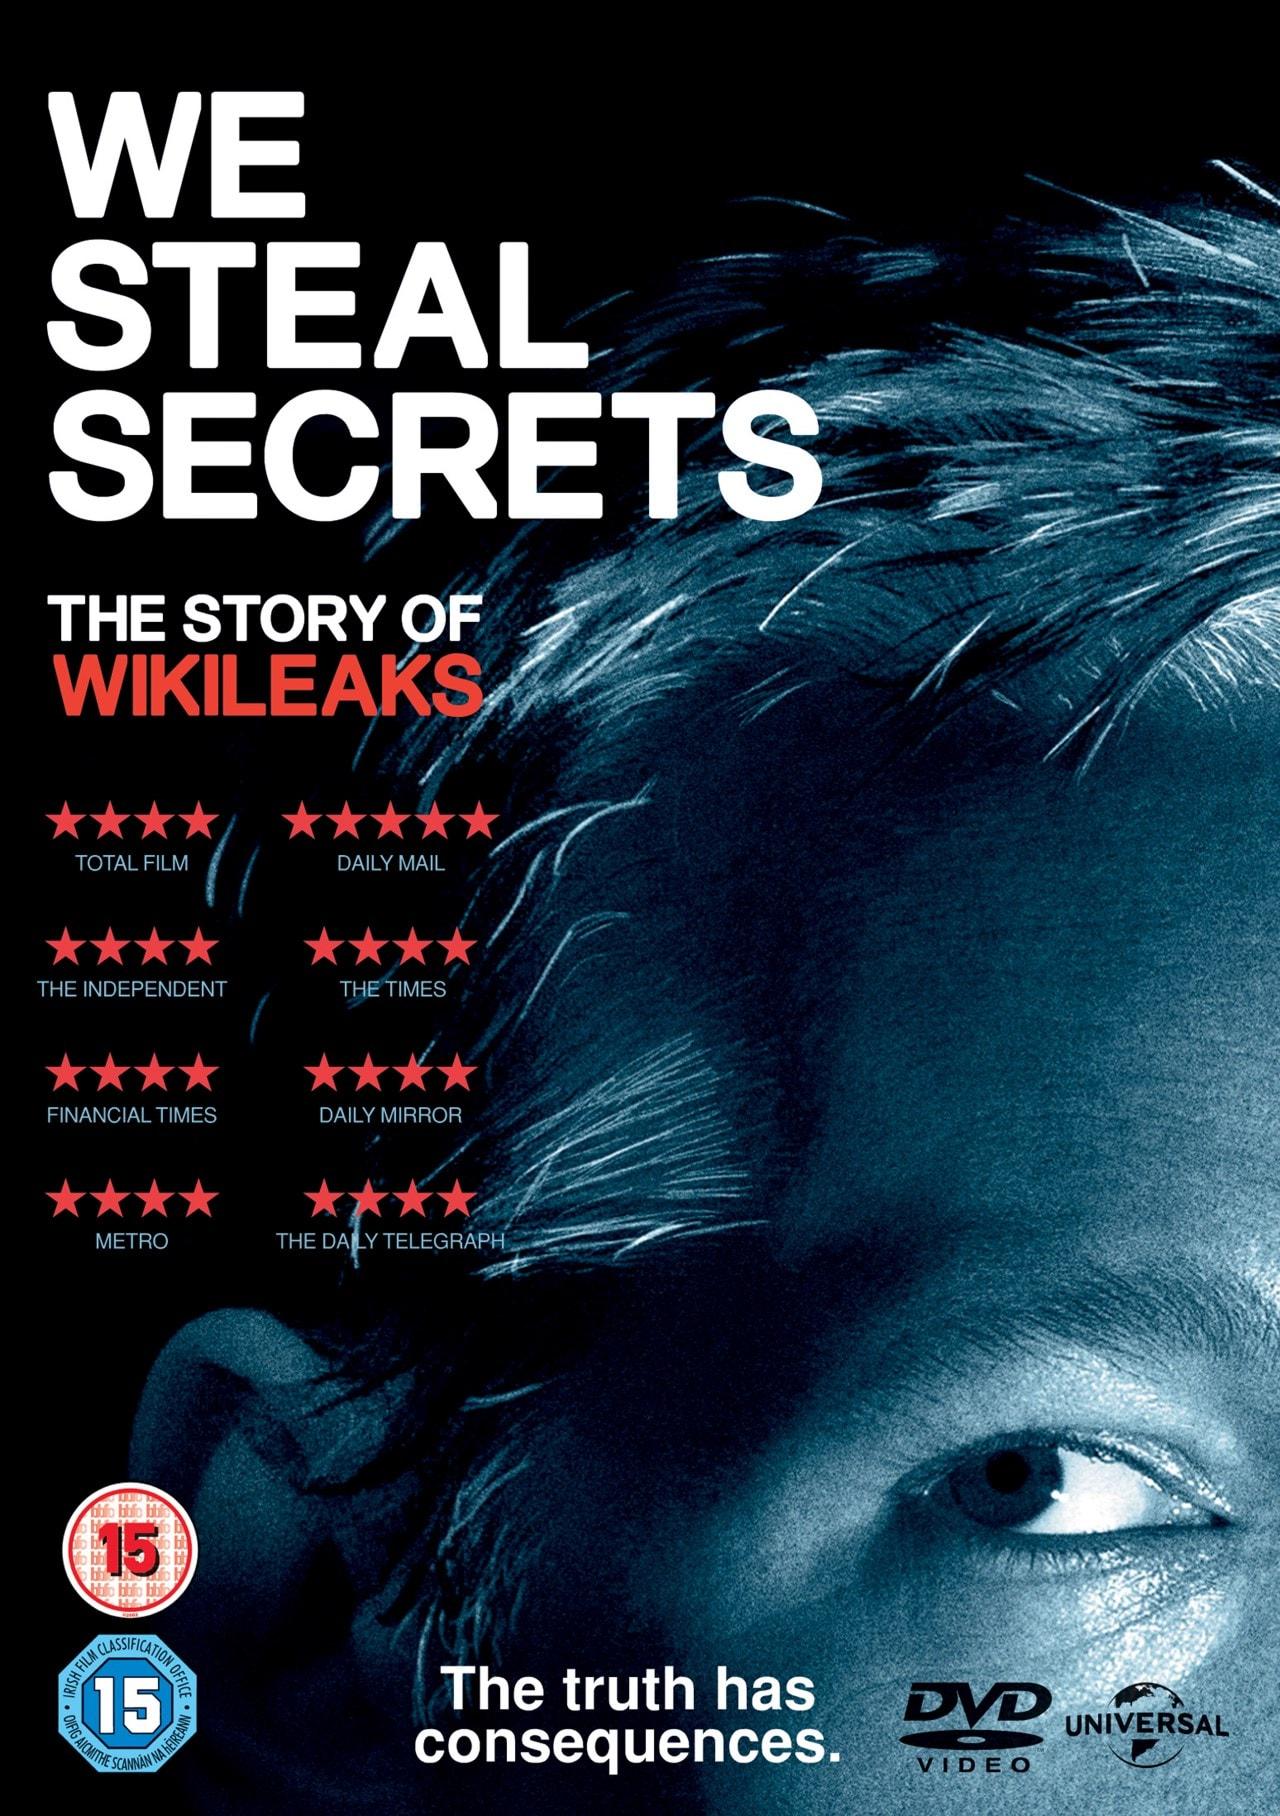 We Steal Secrets - The Story of WikiLeaks - 1